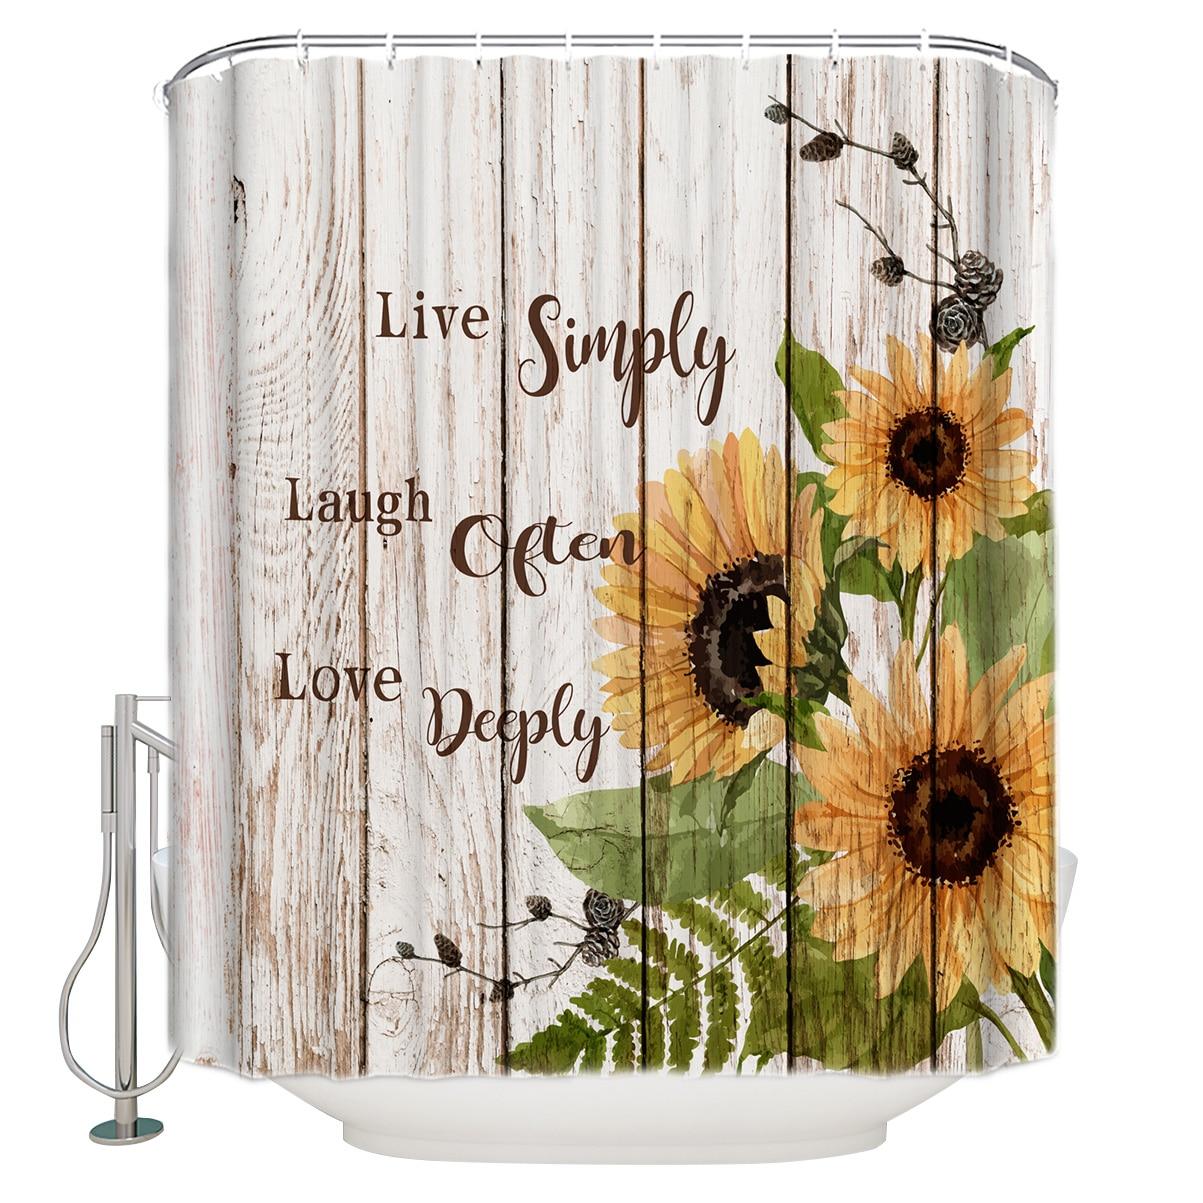 Retro girasol vivir simplemente reírse con frecuencia we love deeply de textura de madera de cortina de ducha, decoración con ganchos impermeable